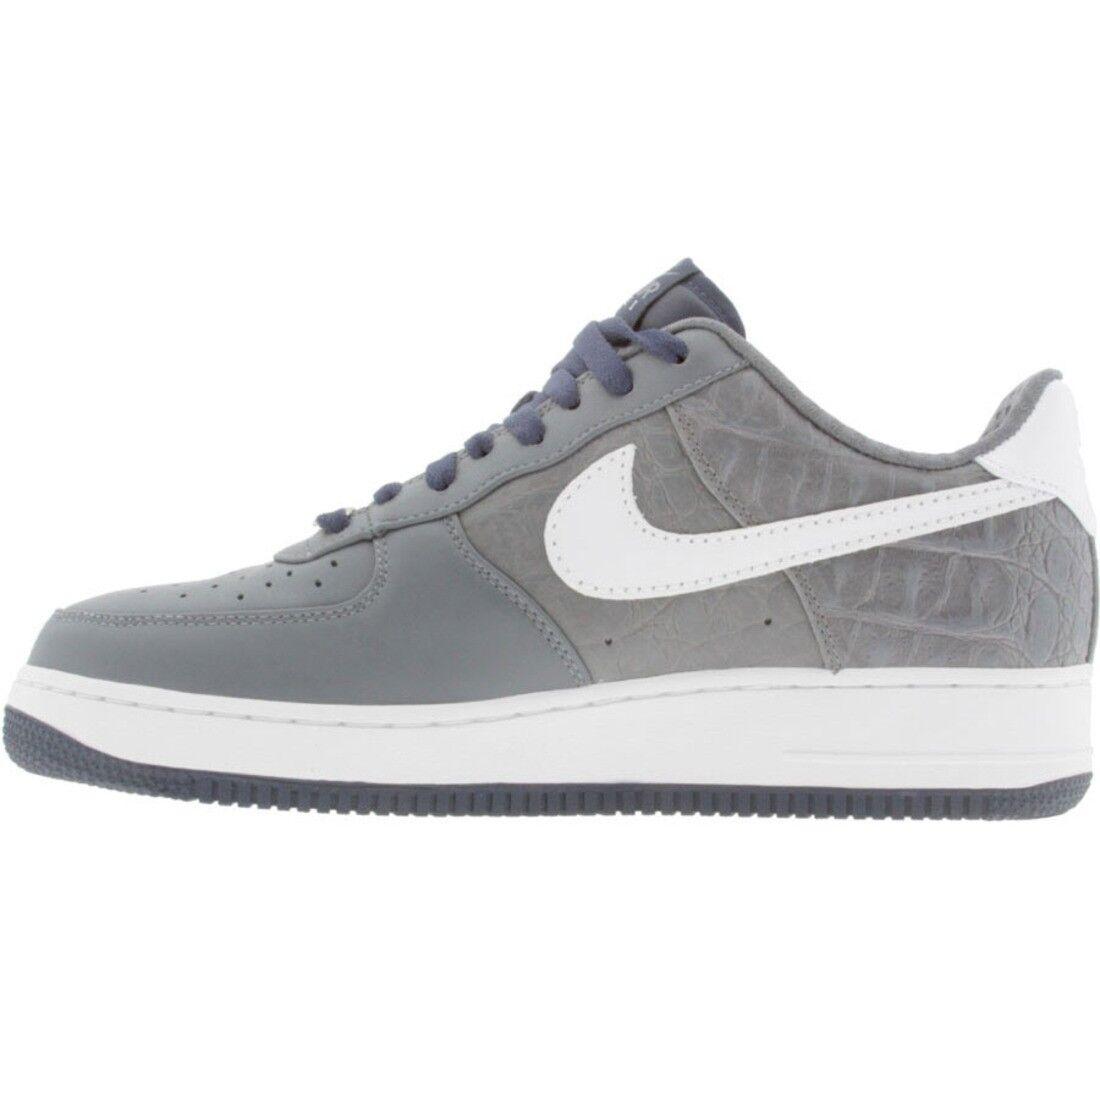 ba206dc268226e 315180-011 Nike Air Force 1 07 Low Premium Flint Grey Grey Grey White  Stealth ...